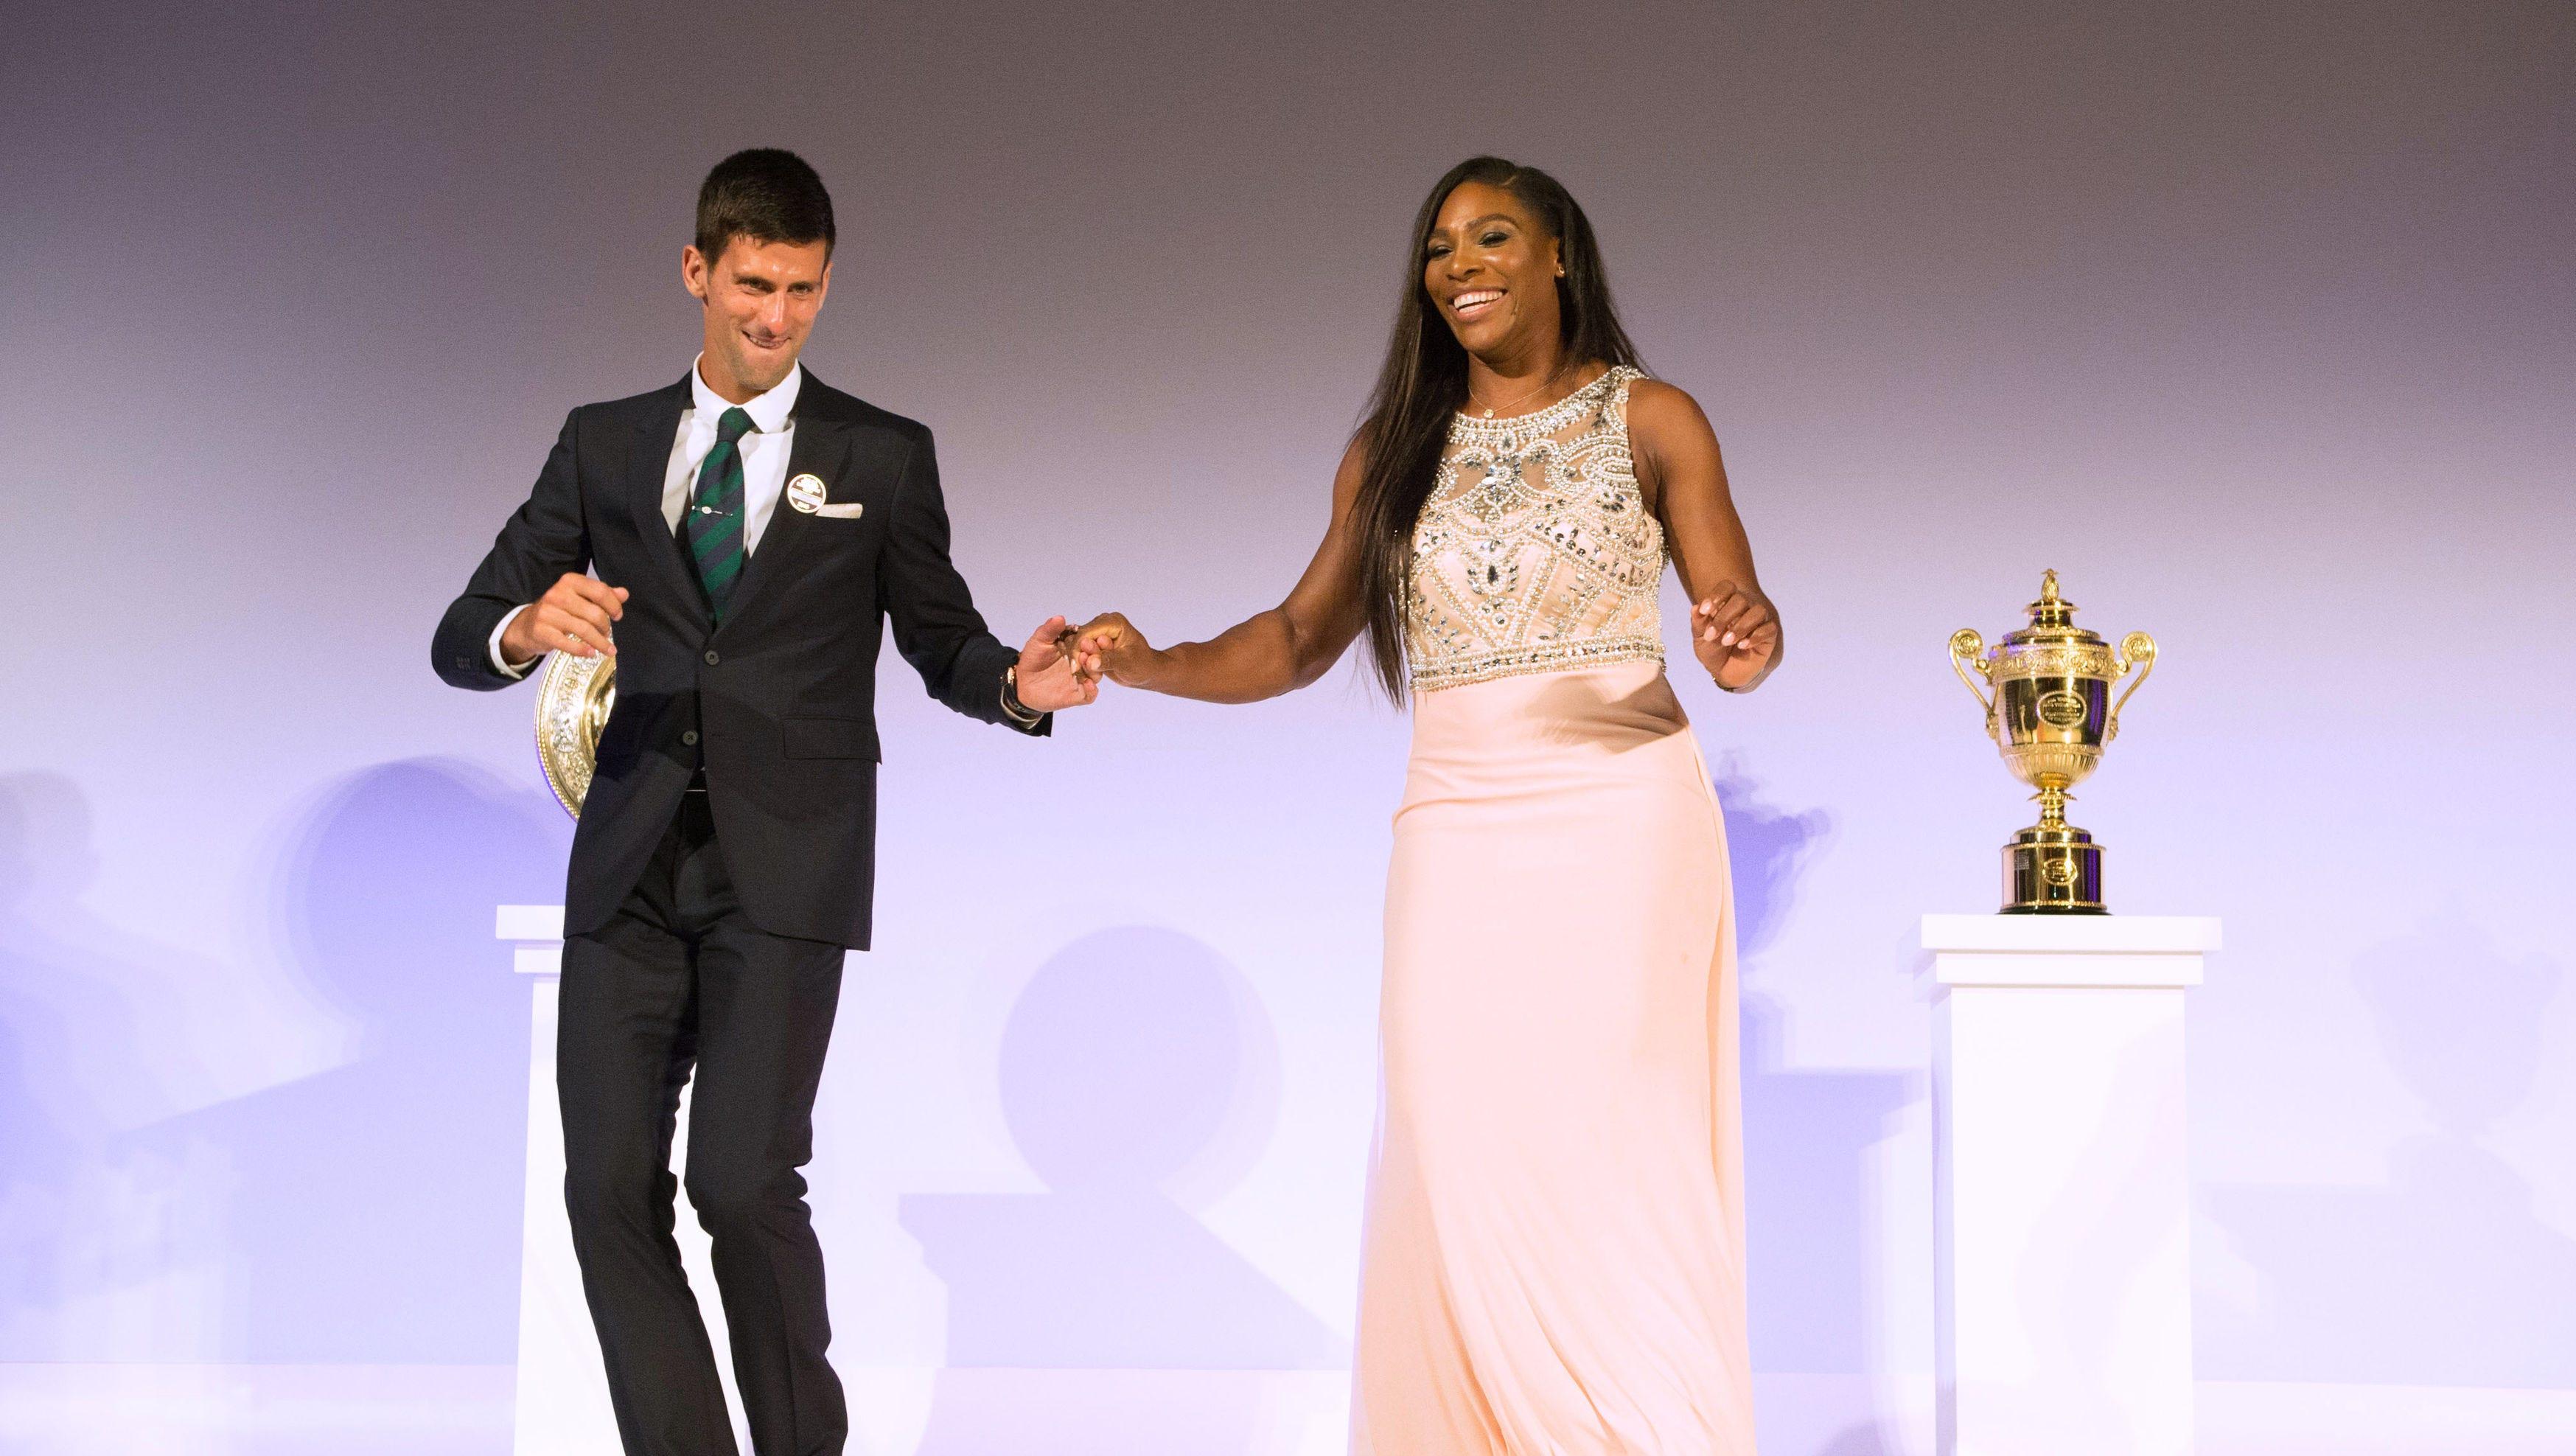 Serena Williams Novak Djokovic Would Love To Dance Again As Champions